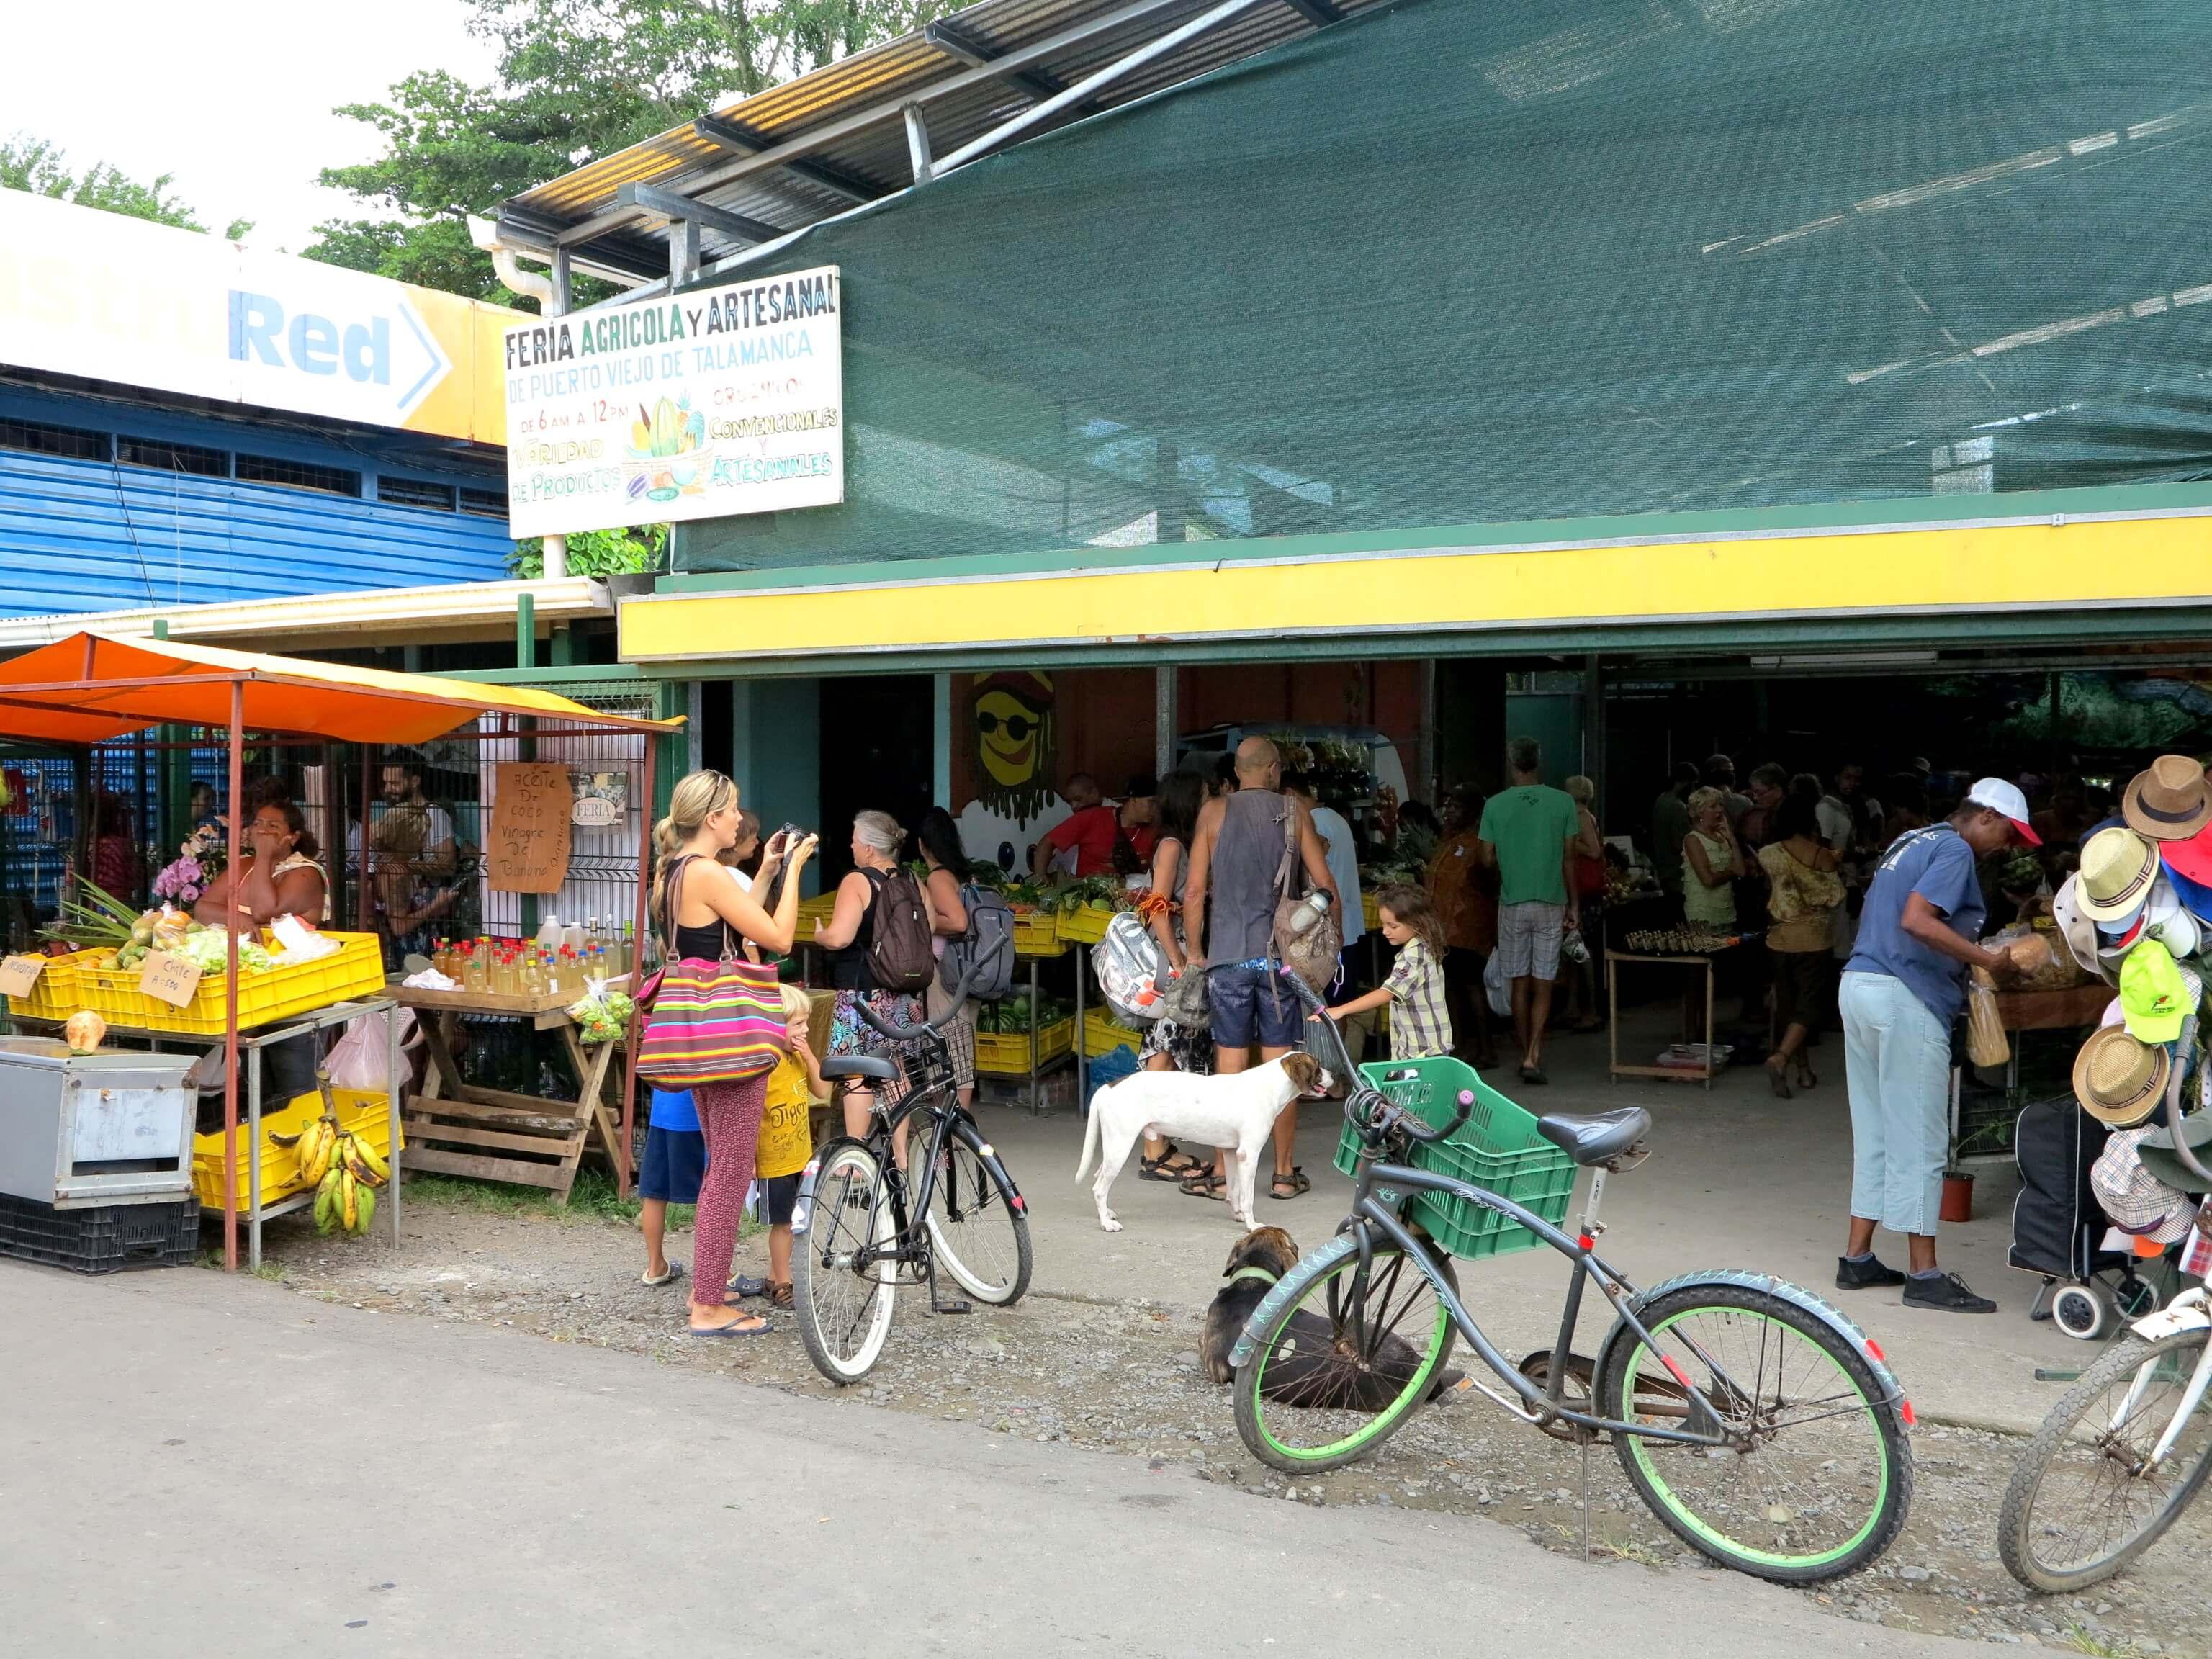 Farmers Market mit Organic Food in Puerto Viejo